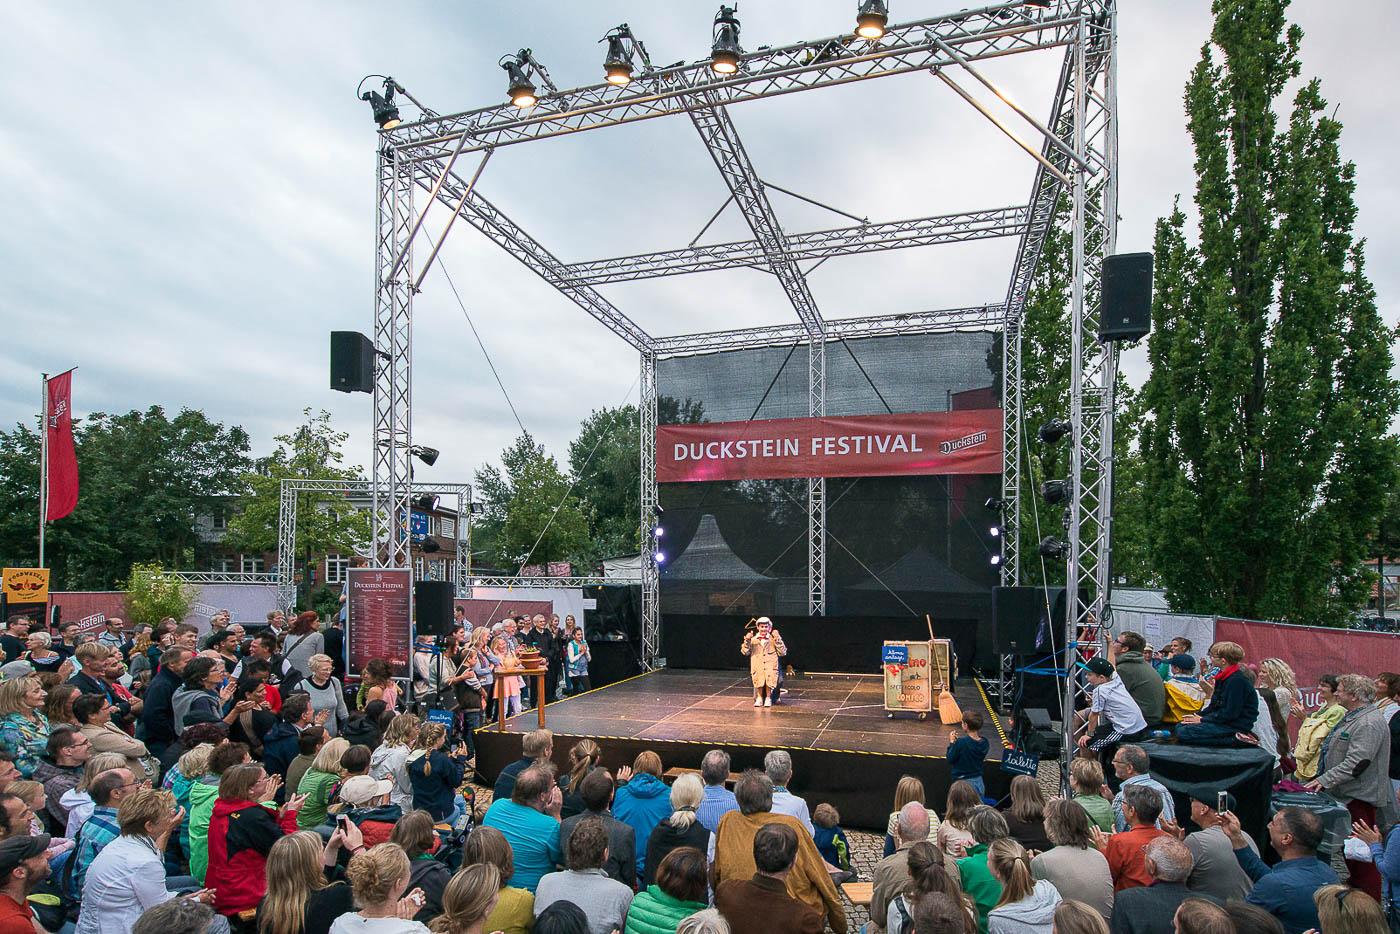 Fotos Duckstein Festival Lbeck  Fotograf  Eventfotograf